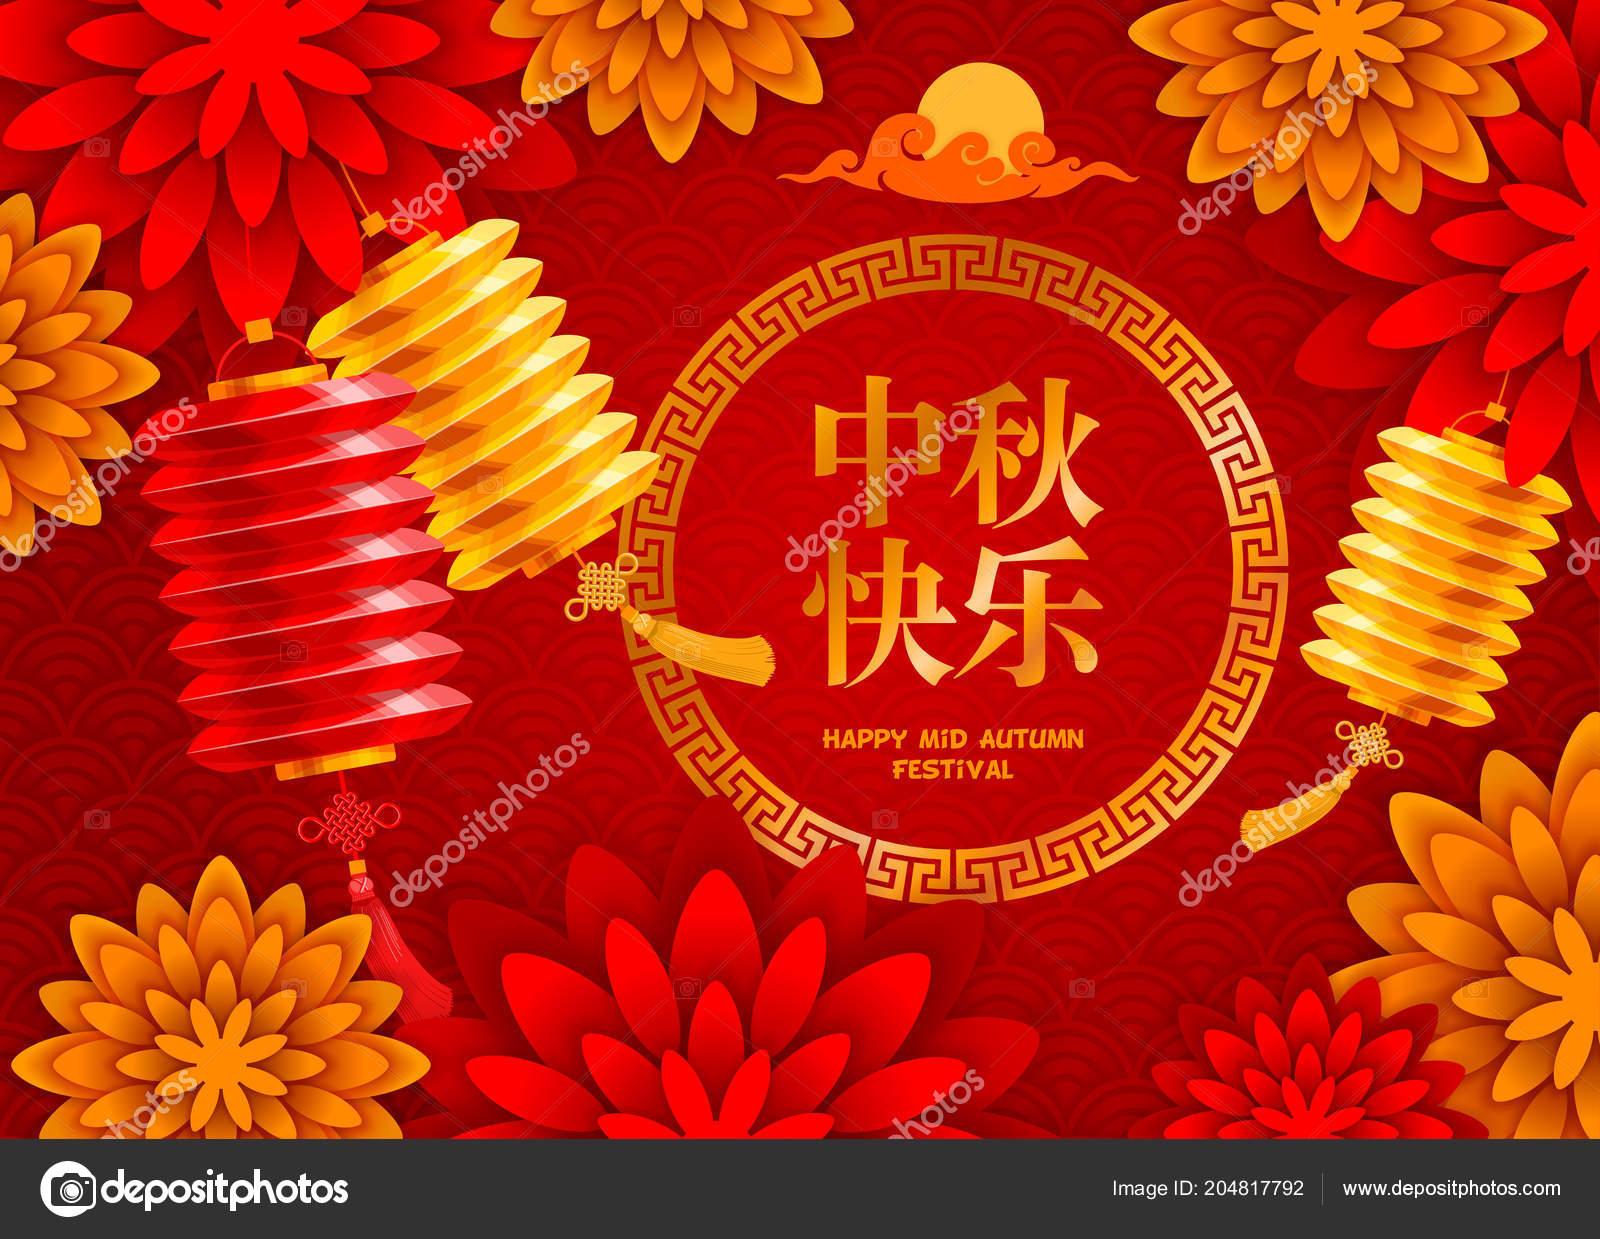 Mid Autumn Festival Design Chinese Paper Lanterns Autumn